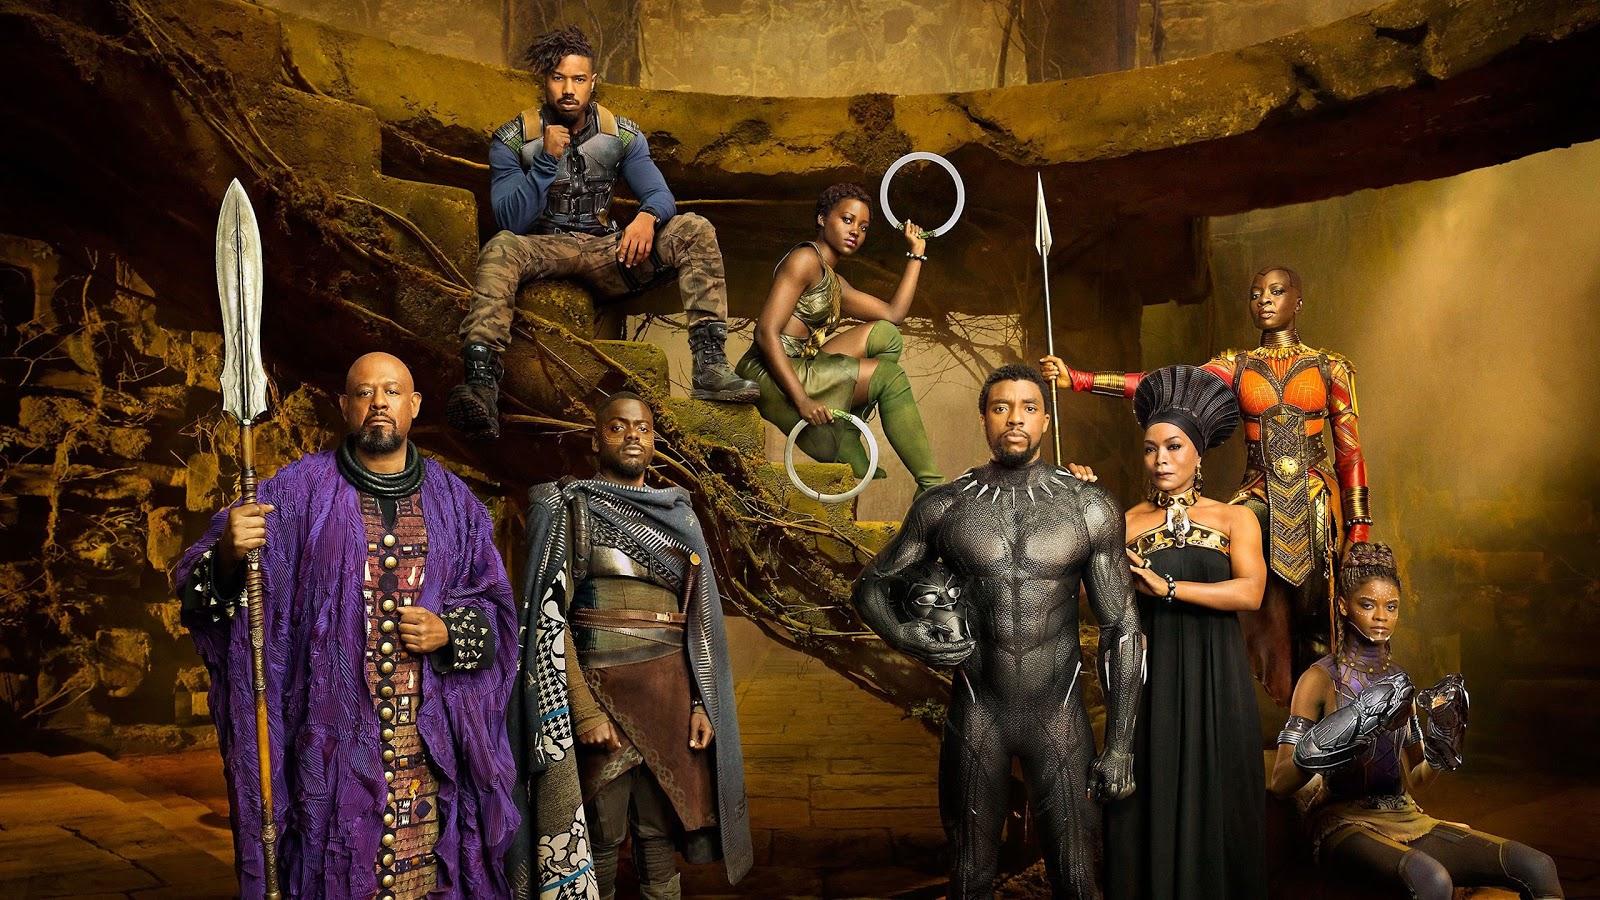 The Black Panther Cast Image Credit:Marvel Studios